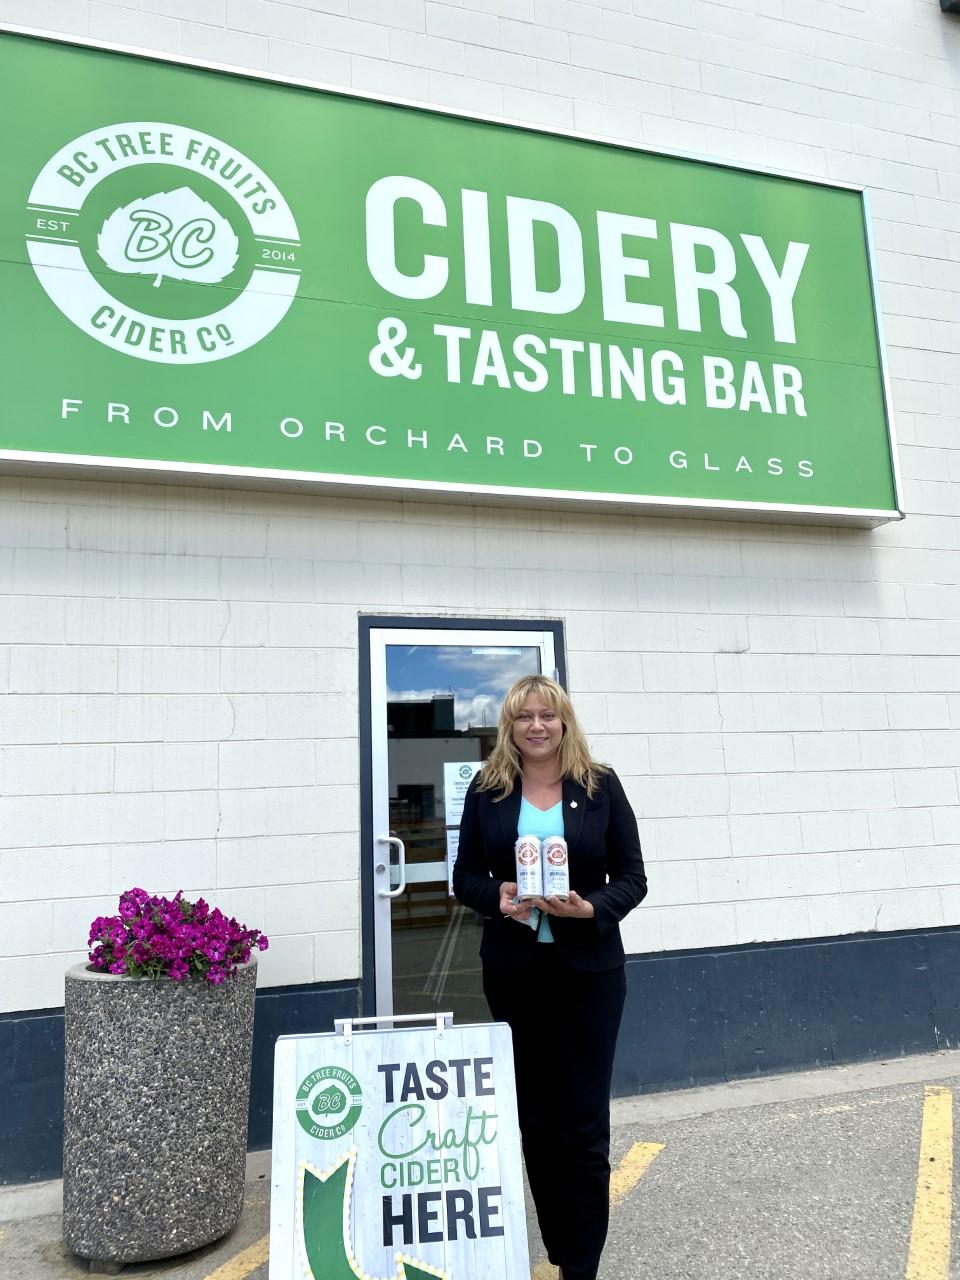 It's BC Cider Week!